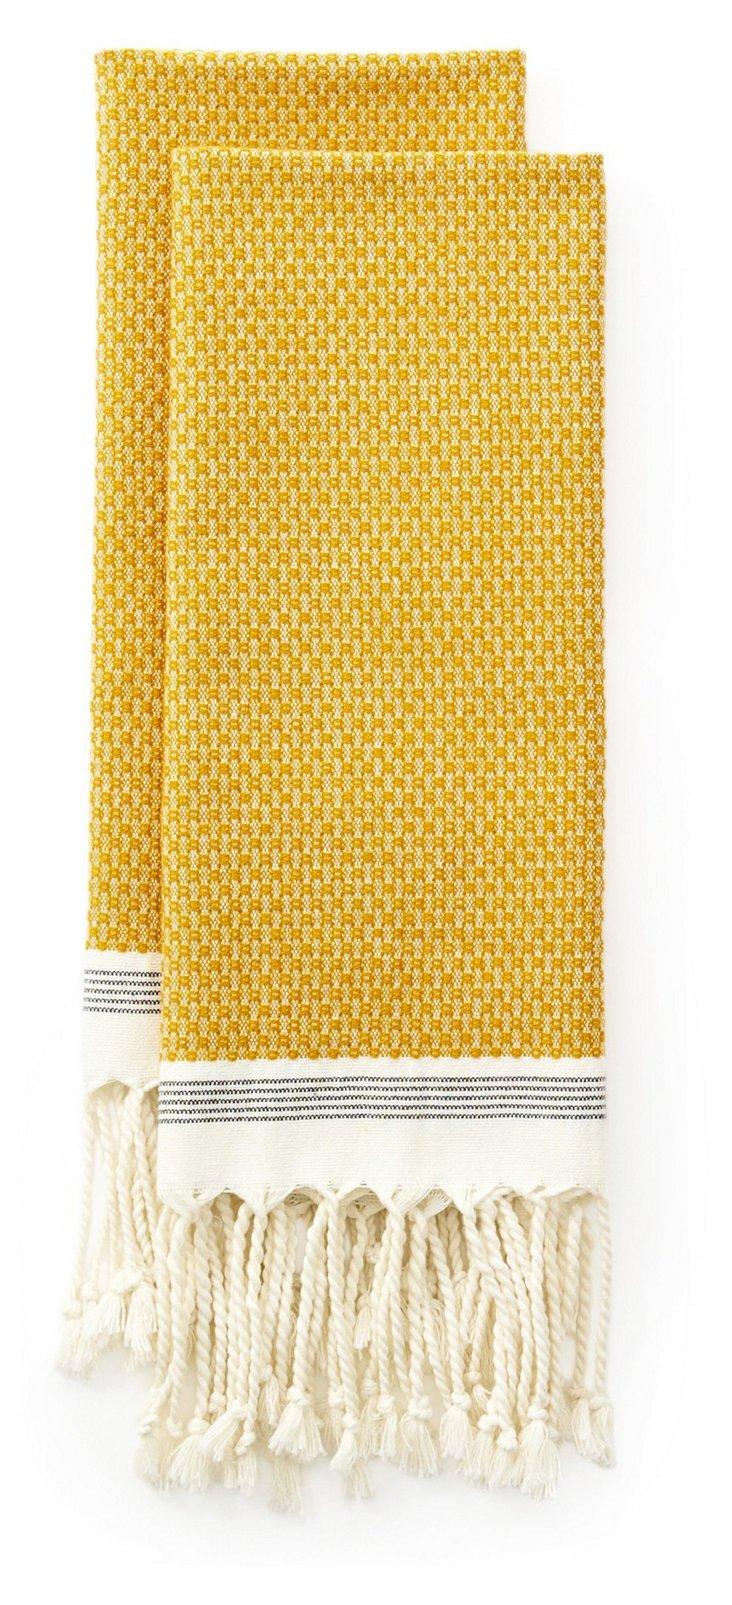 S/2 Mediterranean Guest Towels, Mustard